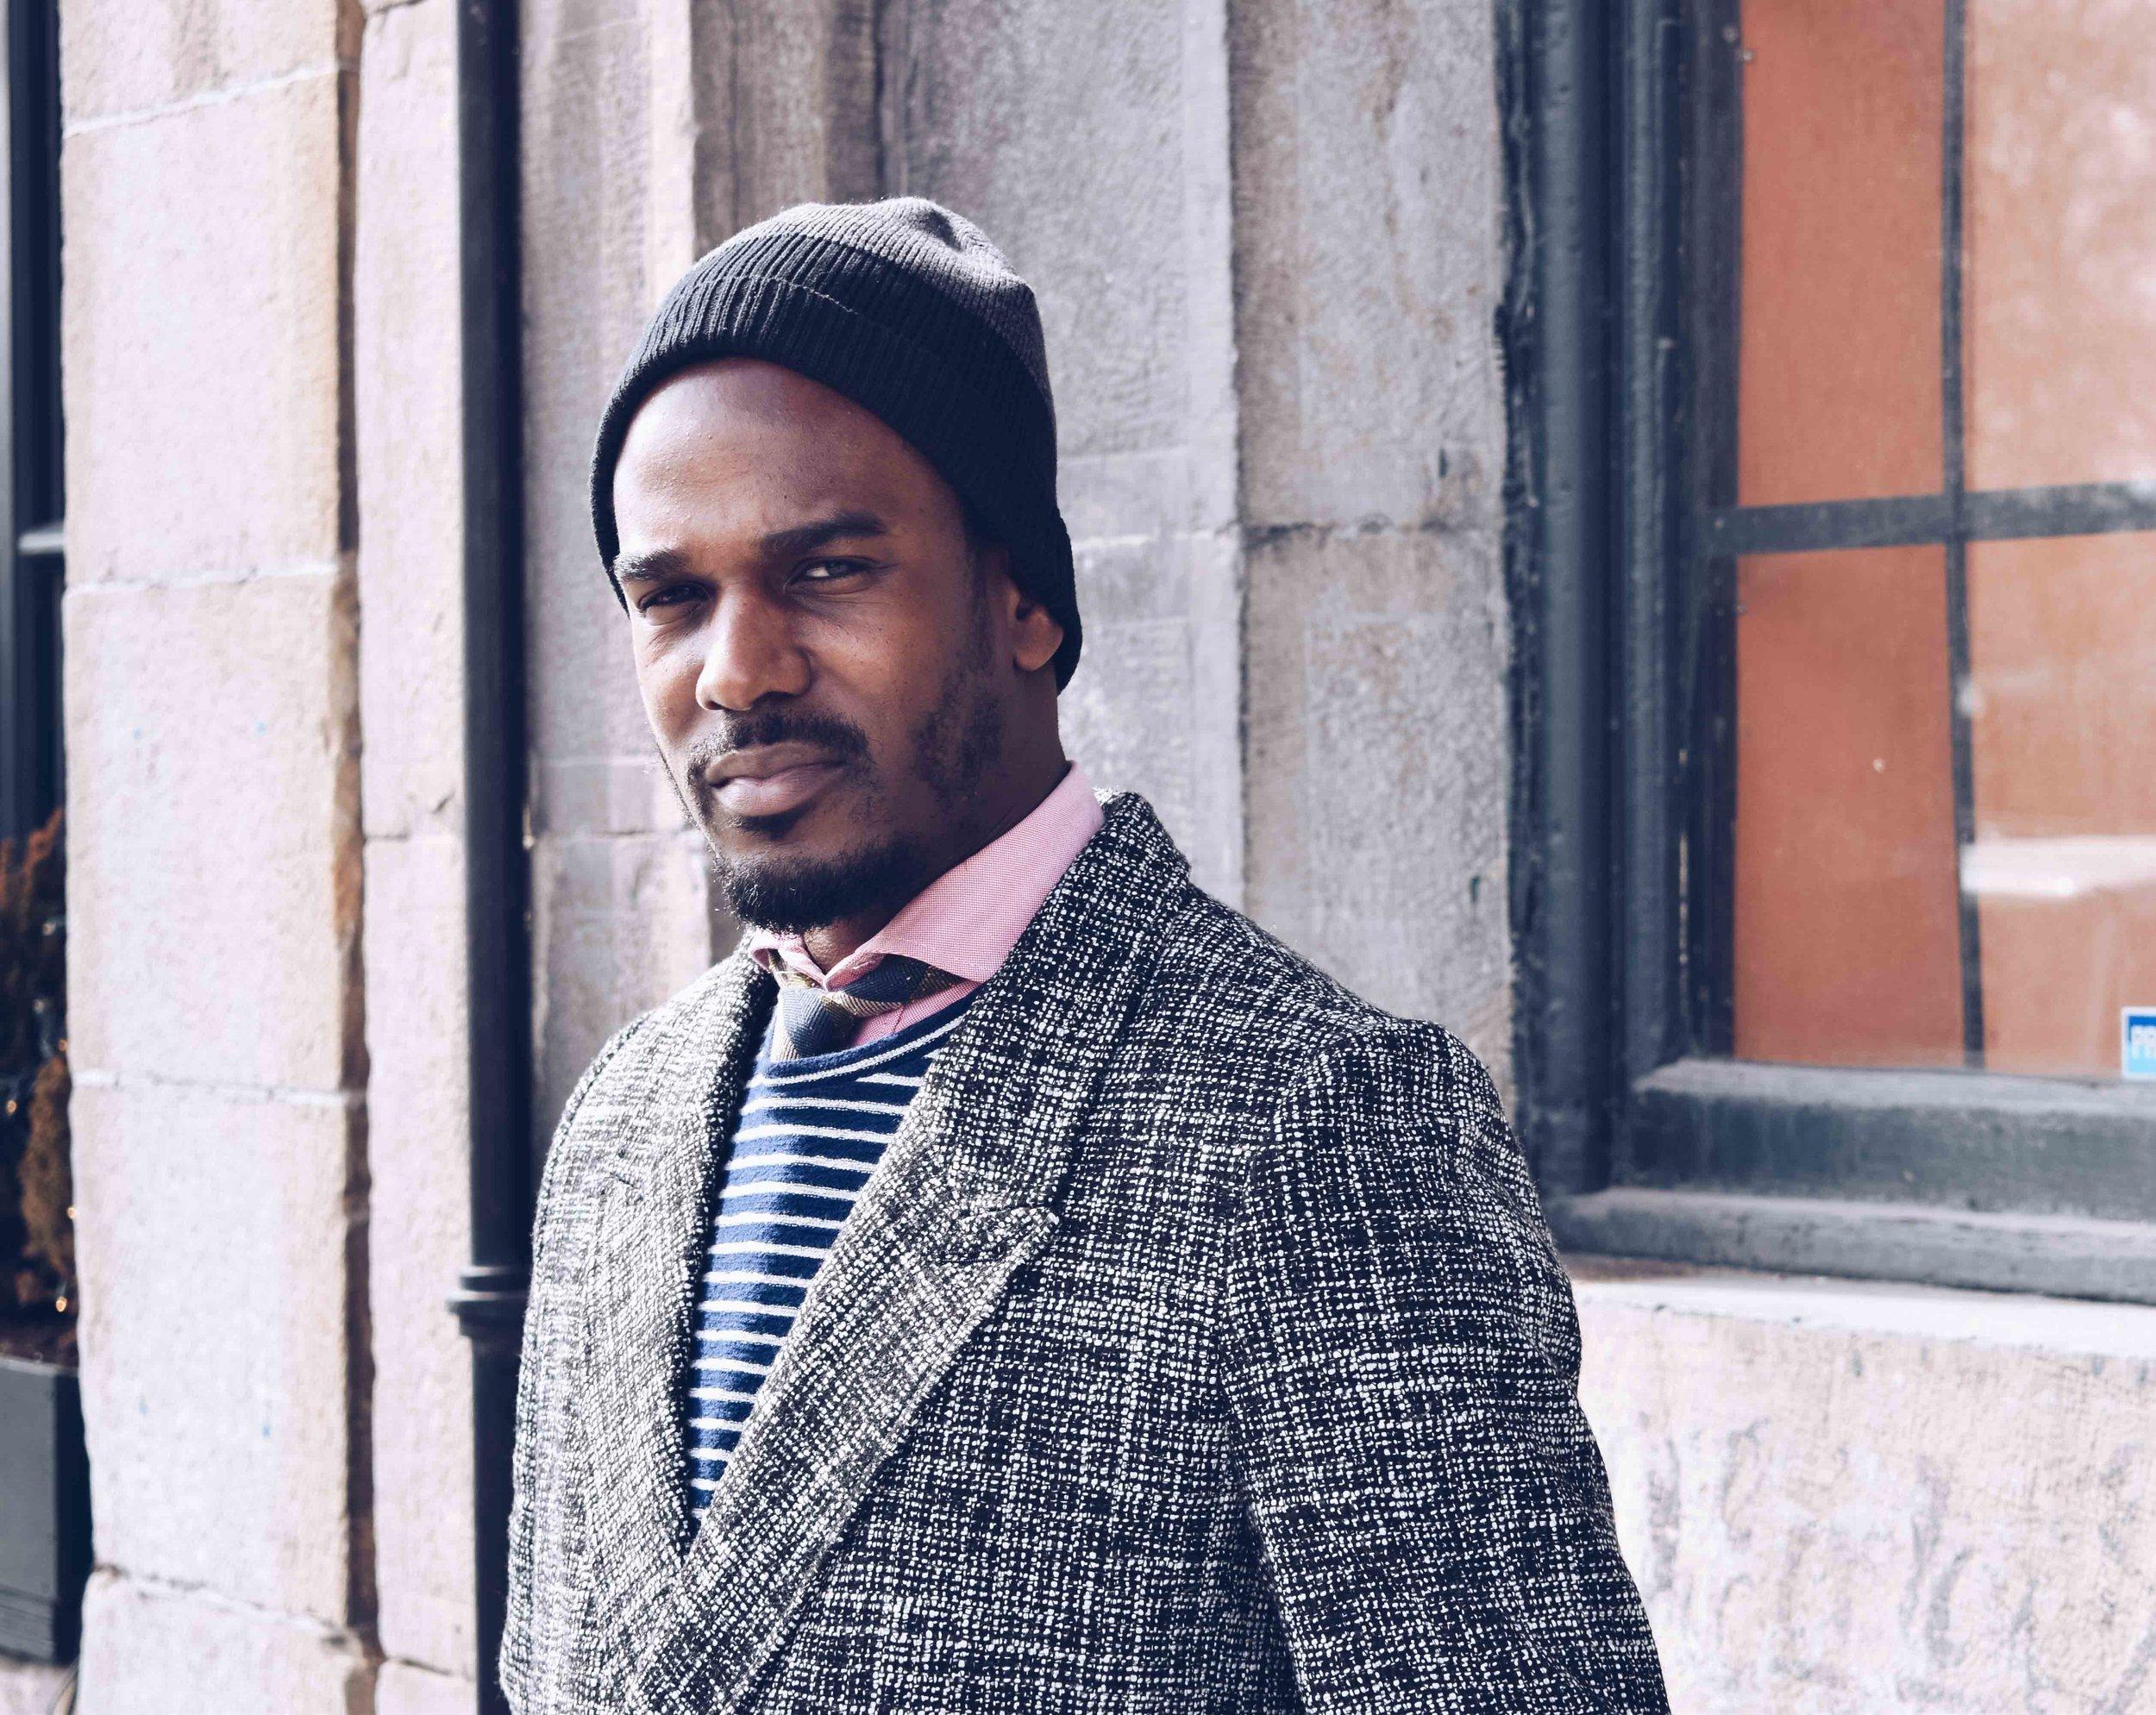 mens fashion trends 2018 new look overcoat zara sweater gregsstyleguide